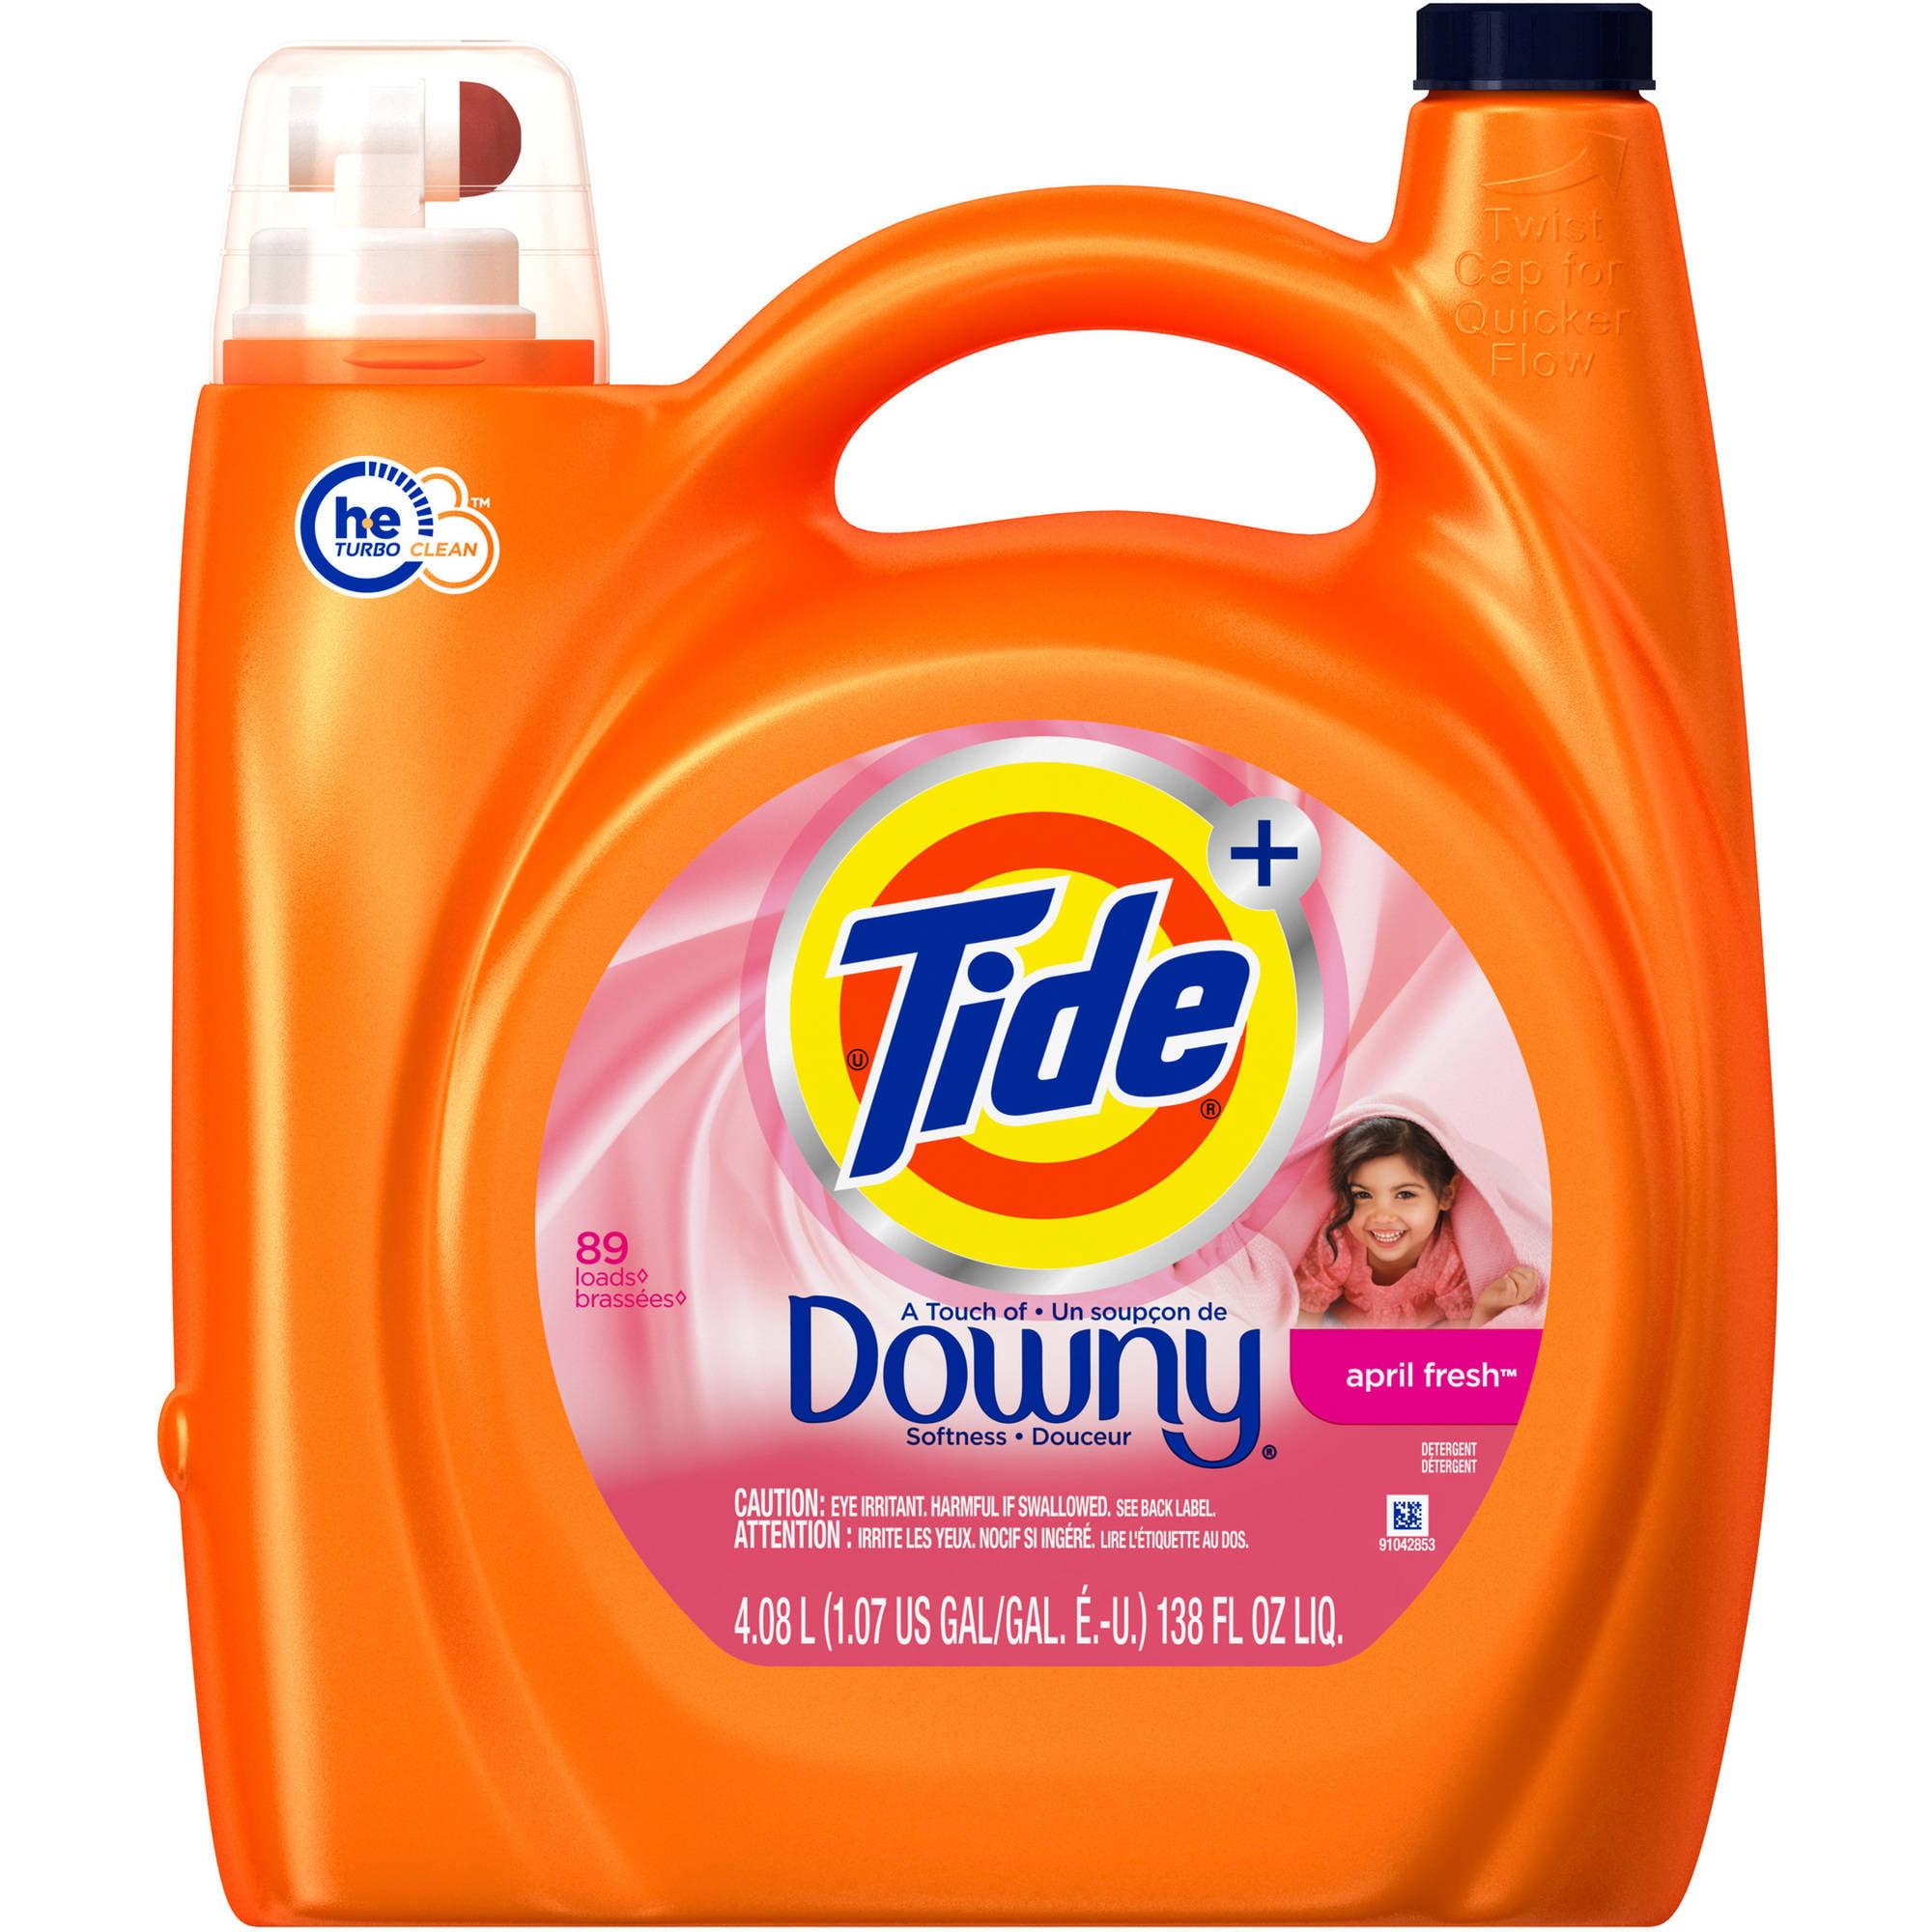 Tide Plus Downy April Fresh Scent HE Turbo Clean Liquid Laundry Detergent, 72 Loads 138 oz